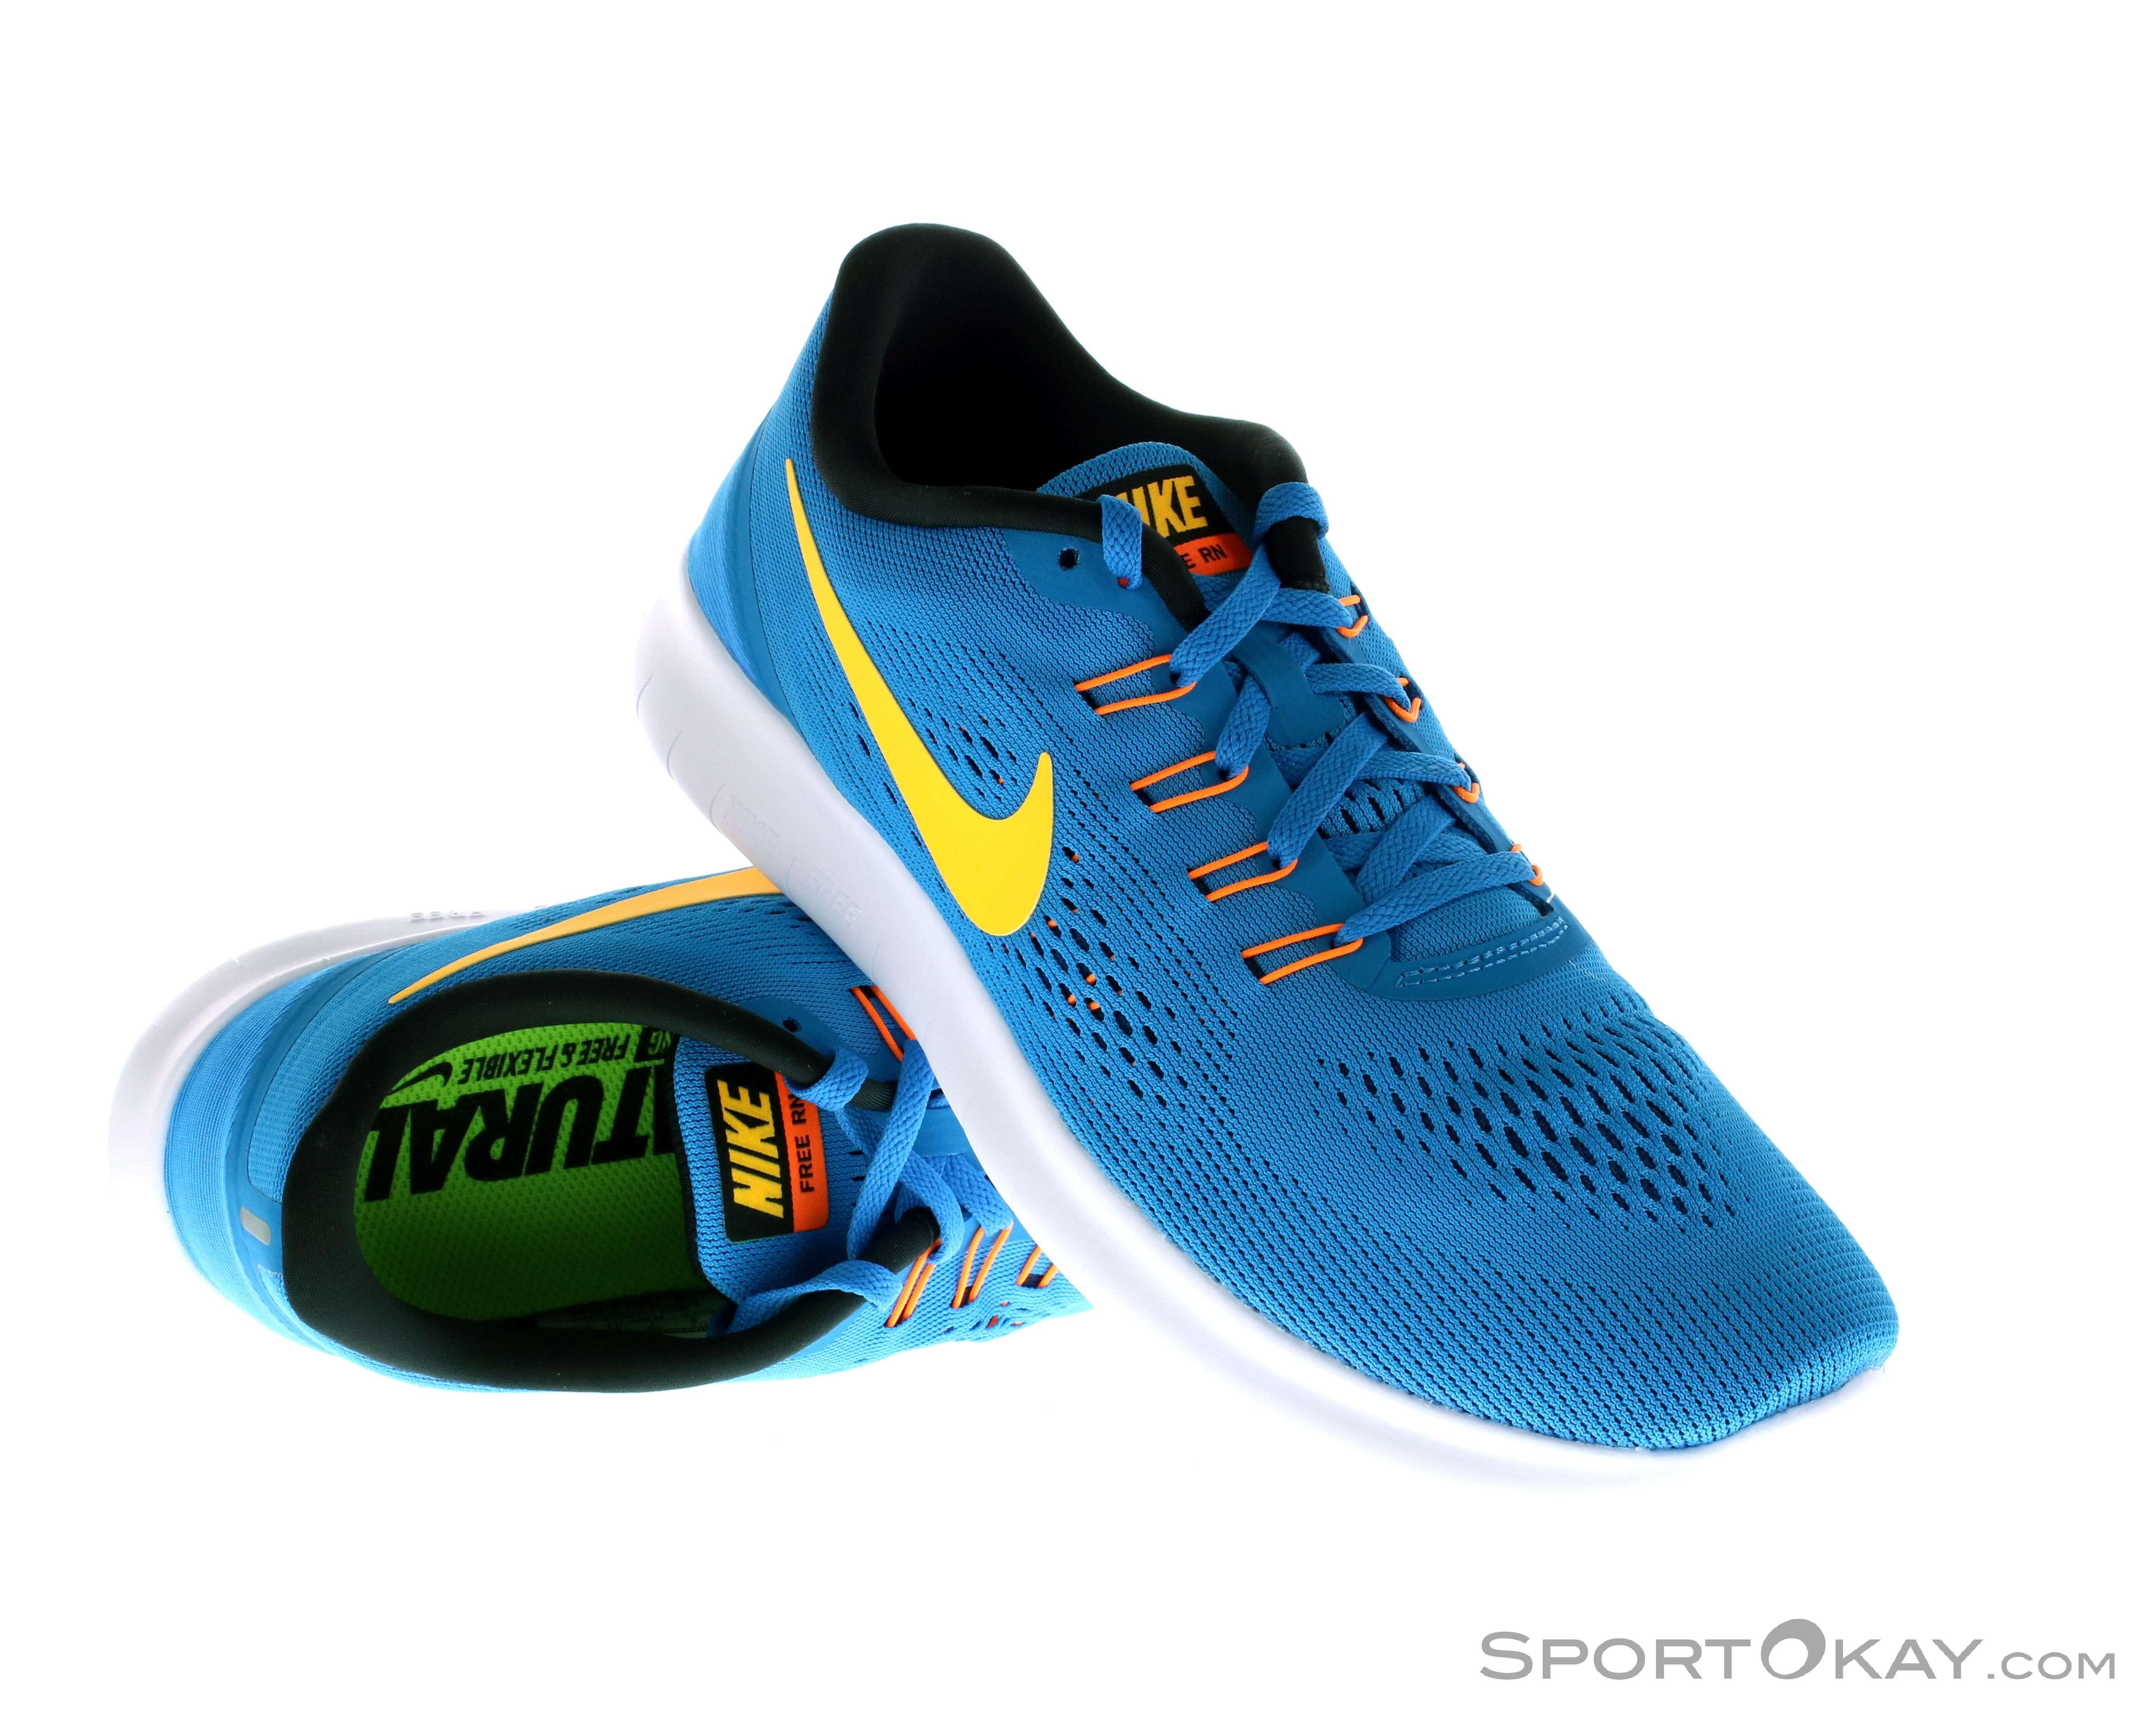 new arrivals ff24d 73186 Nike Free RN Uomo Scarpe da Corsa Allround , Nike, Giallo, , Uomo,